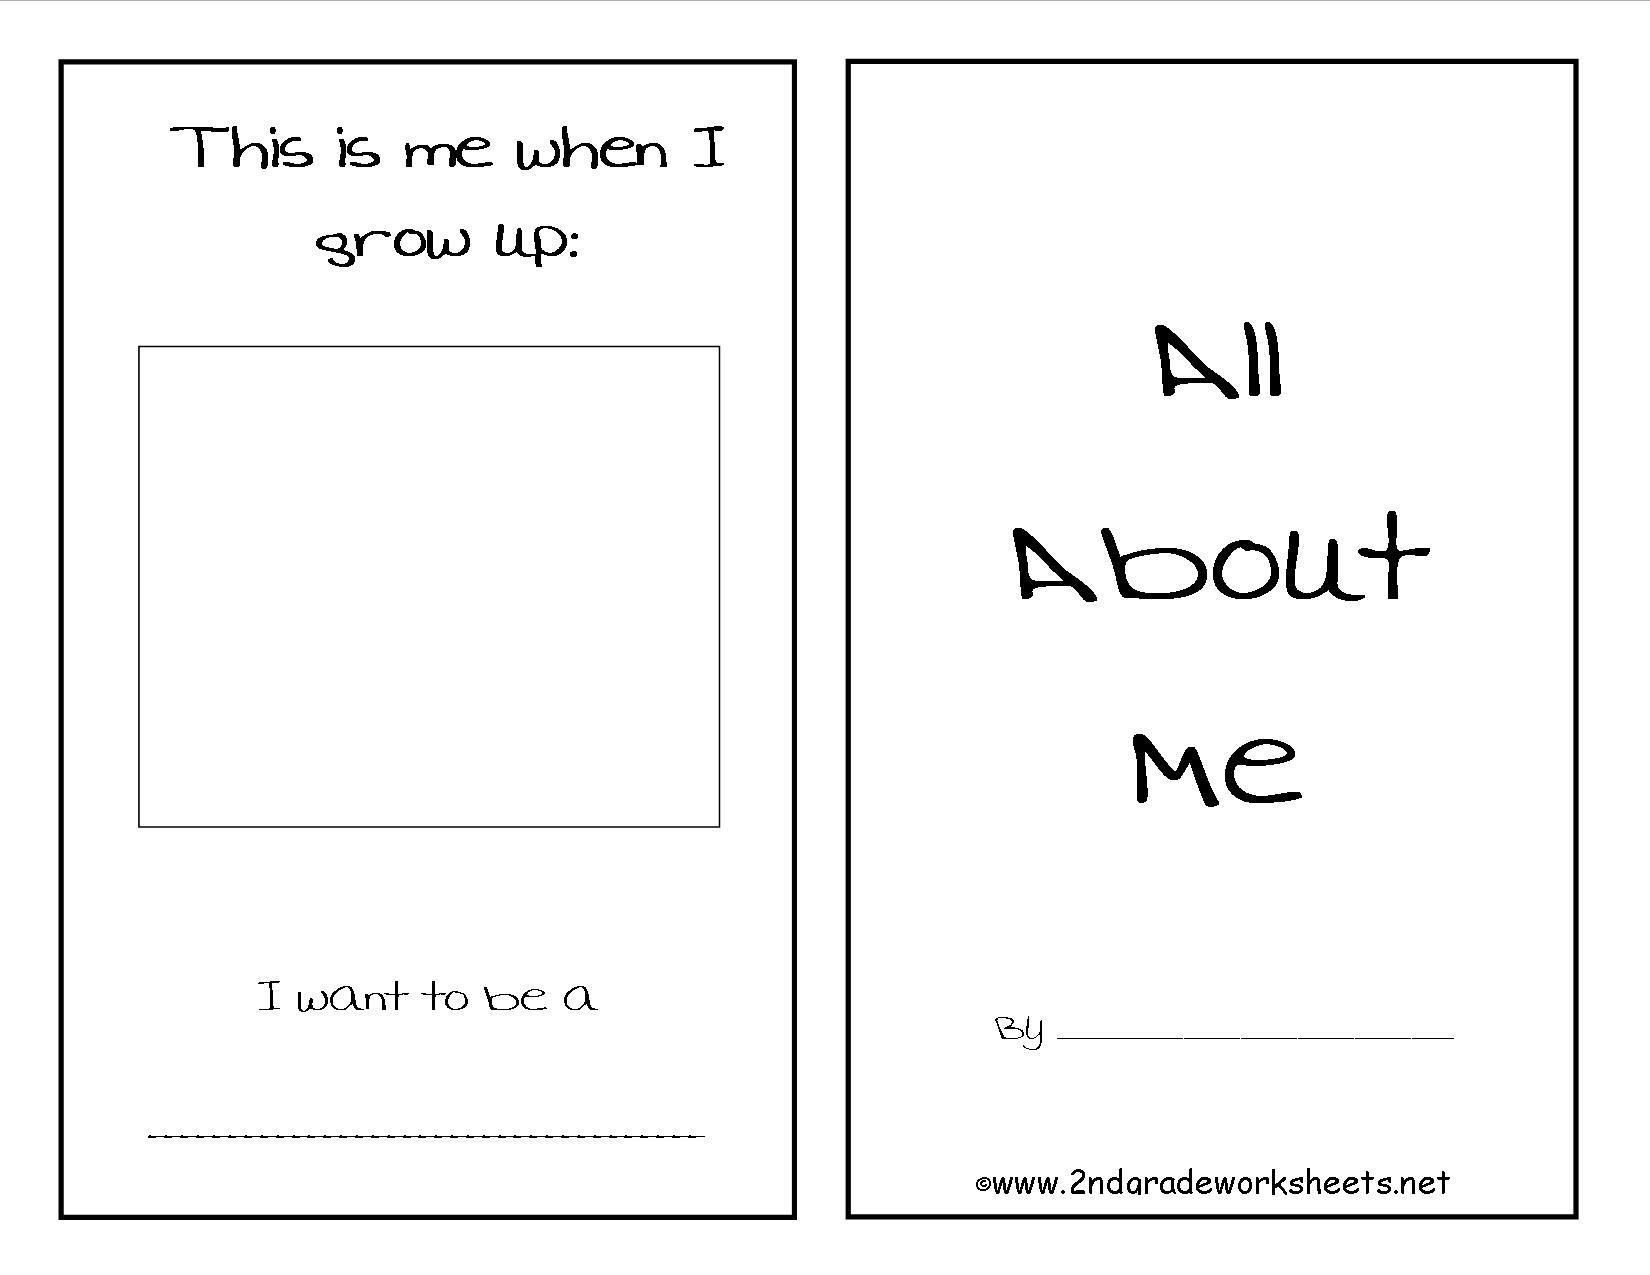 Free Back To School Worksheets And Printouts - Free Printable Homework Worksheets